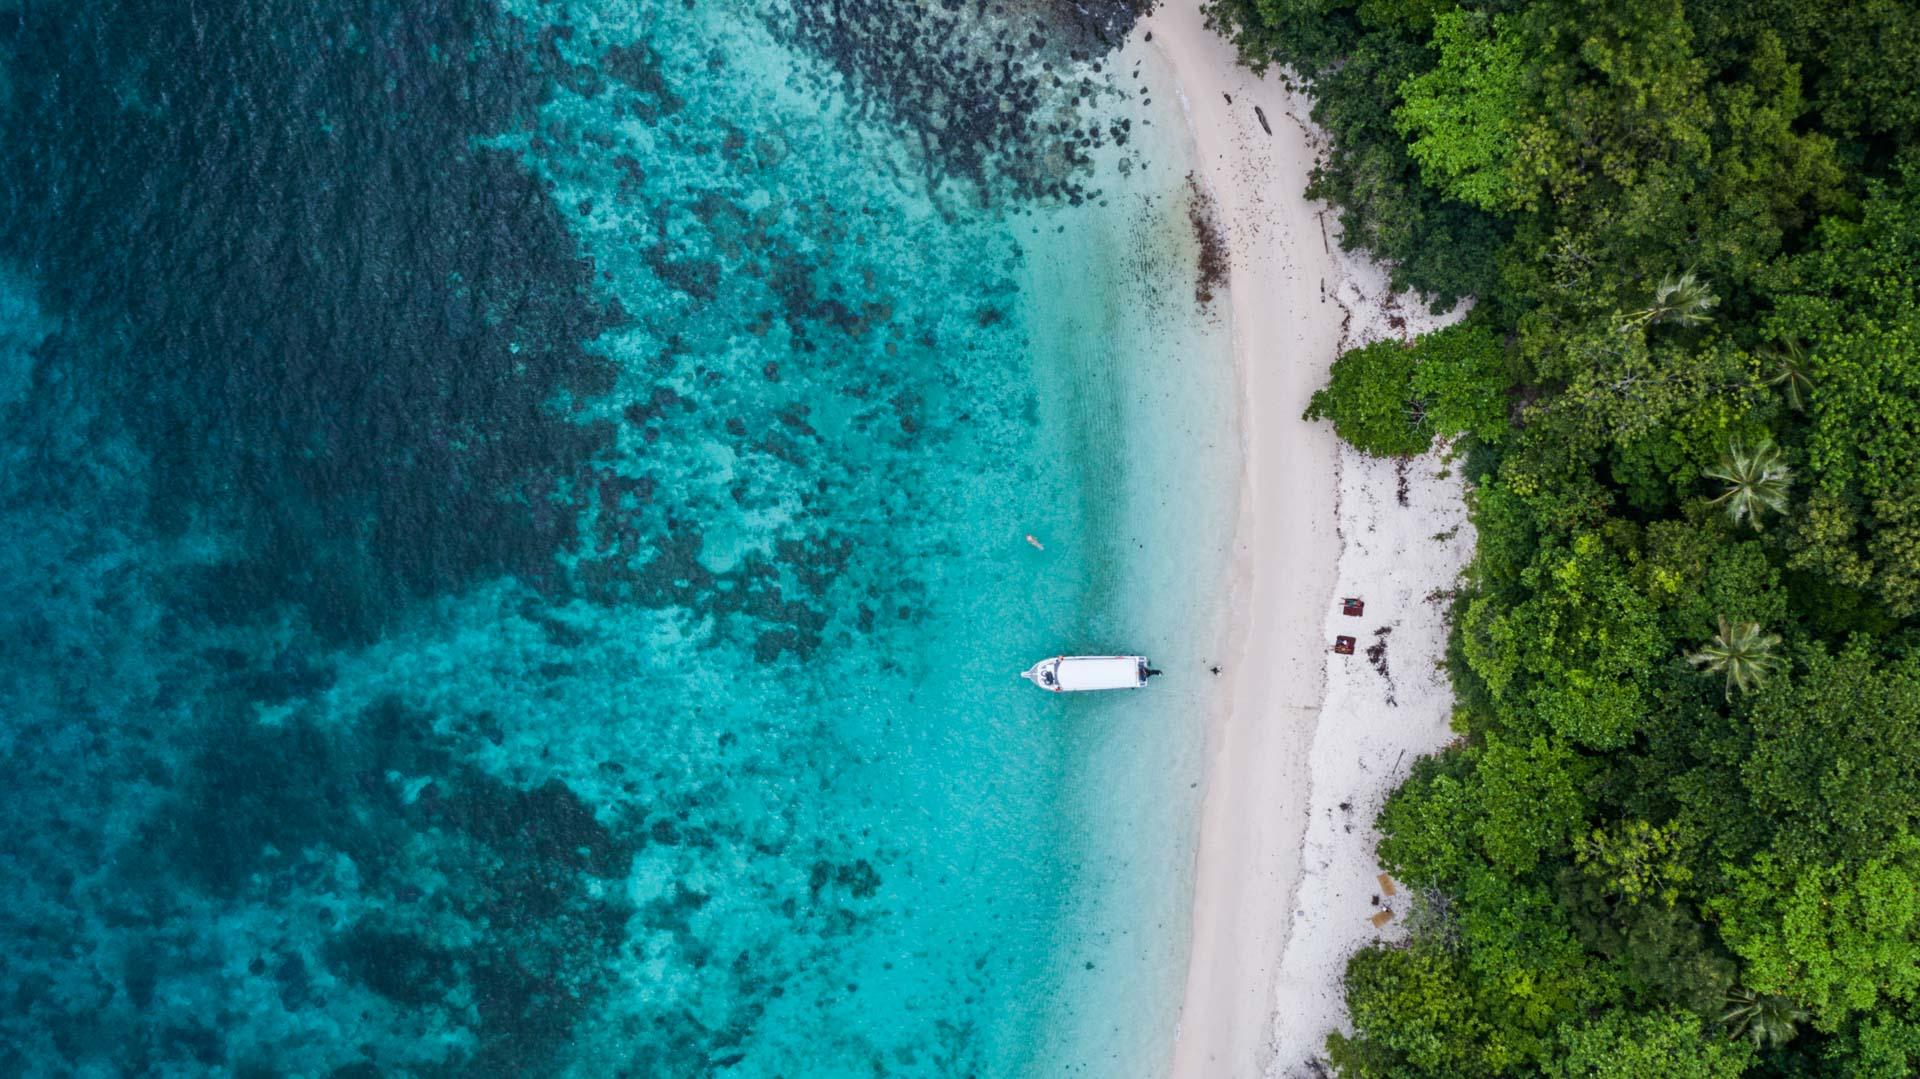 Tioman Island Malaysia Pescart Travel Photo Blog Enrico Pescantini Coral Island aerial view drone 5